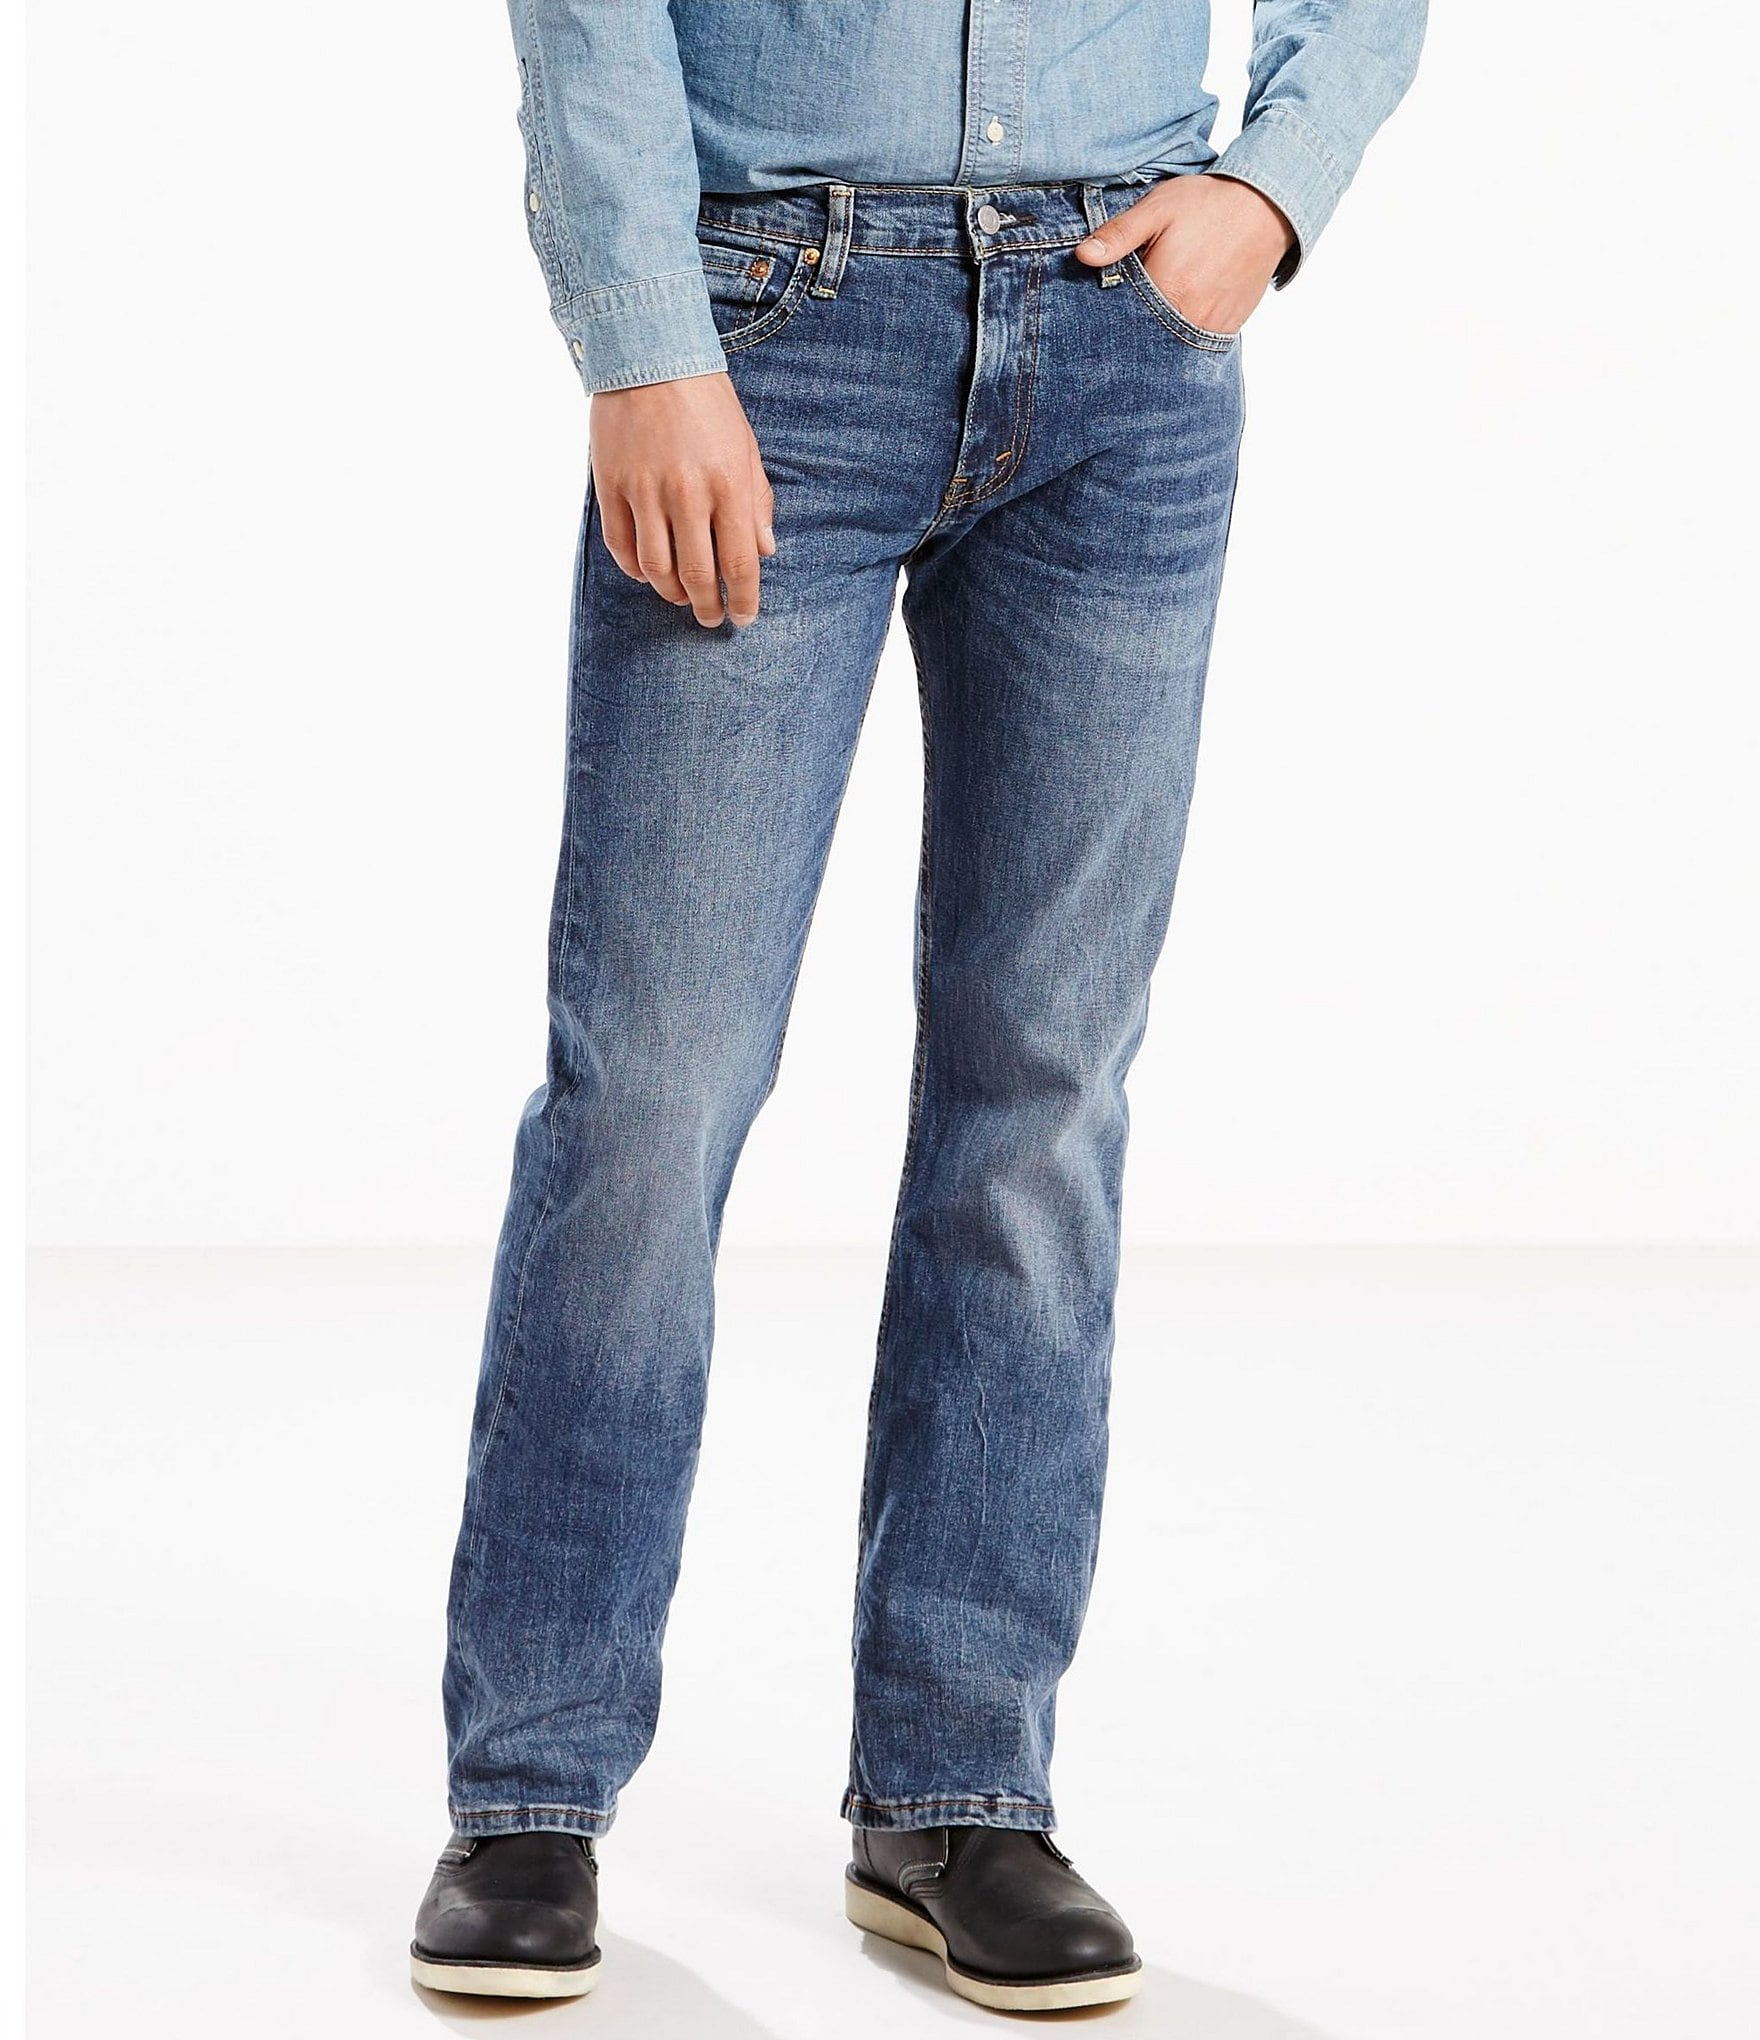 levi s 527 bootcut stretch jeans dillards. Black Bedroom Furniture Sets. Home Design Ideas